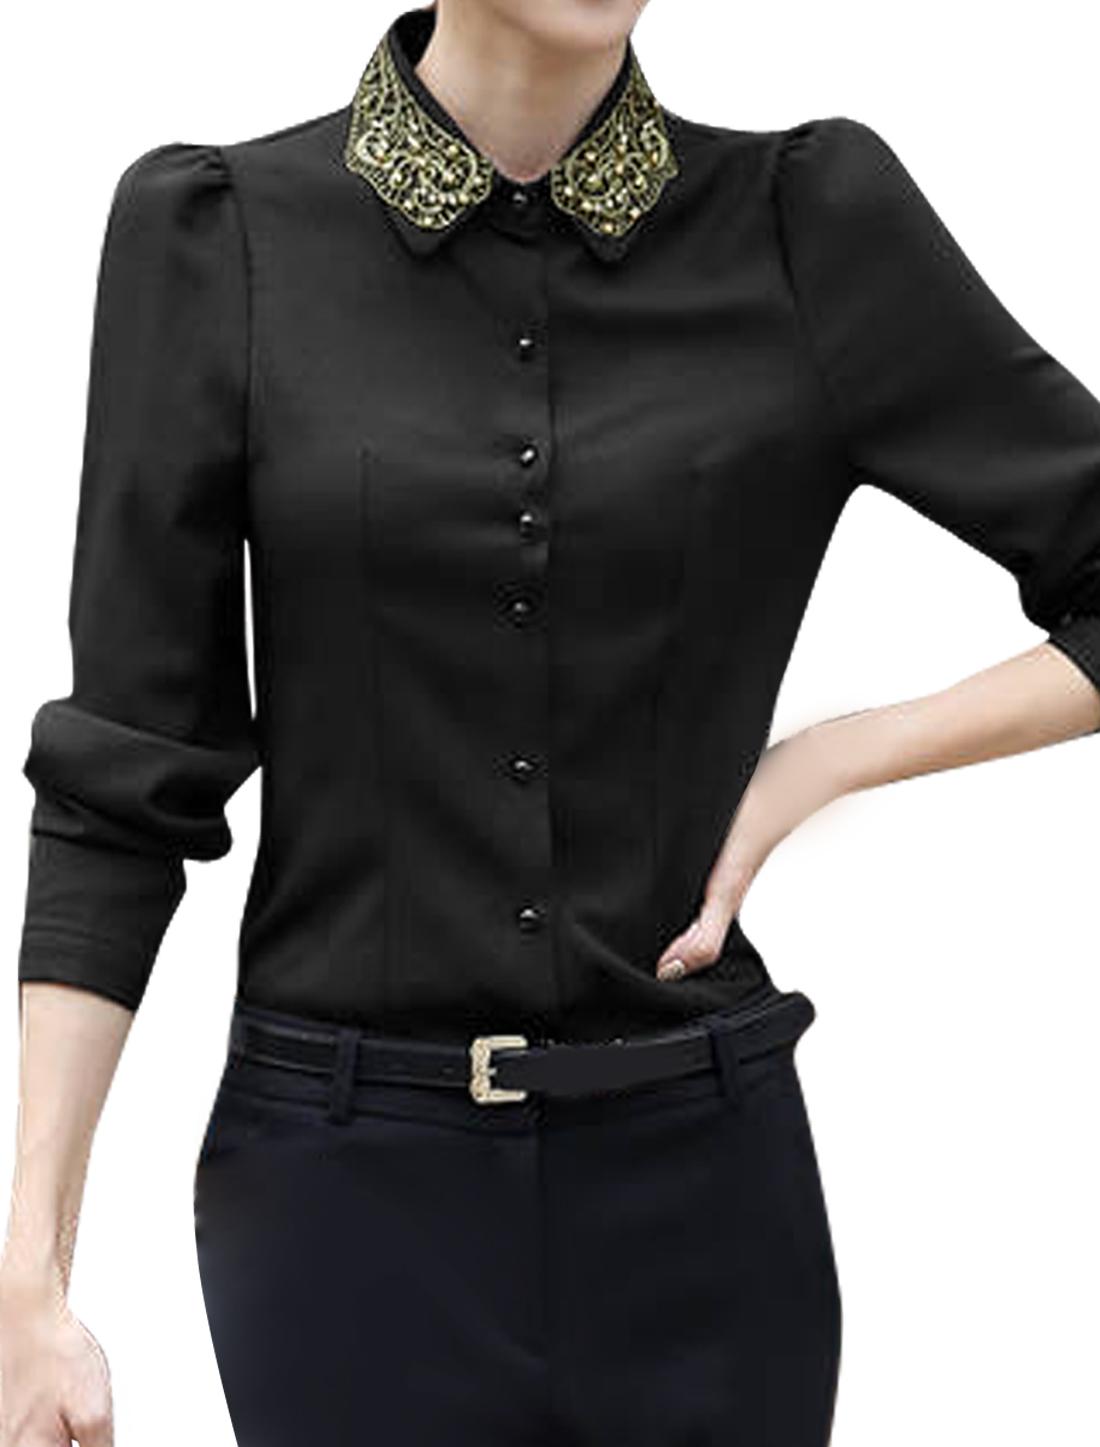 Lady Point Collar Long Sleeves Round Hem Slim Fit Shirt Black M